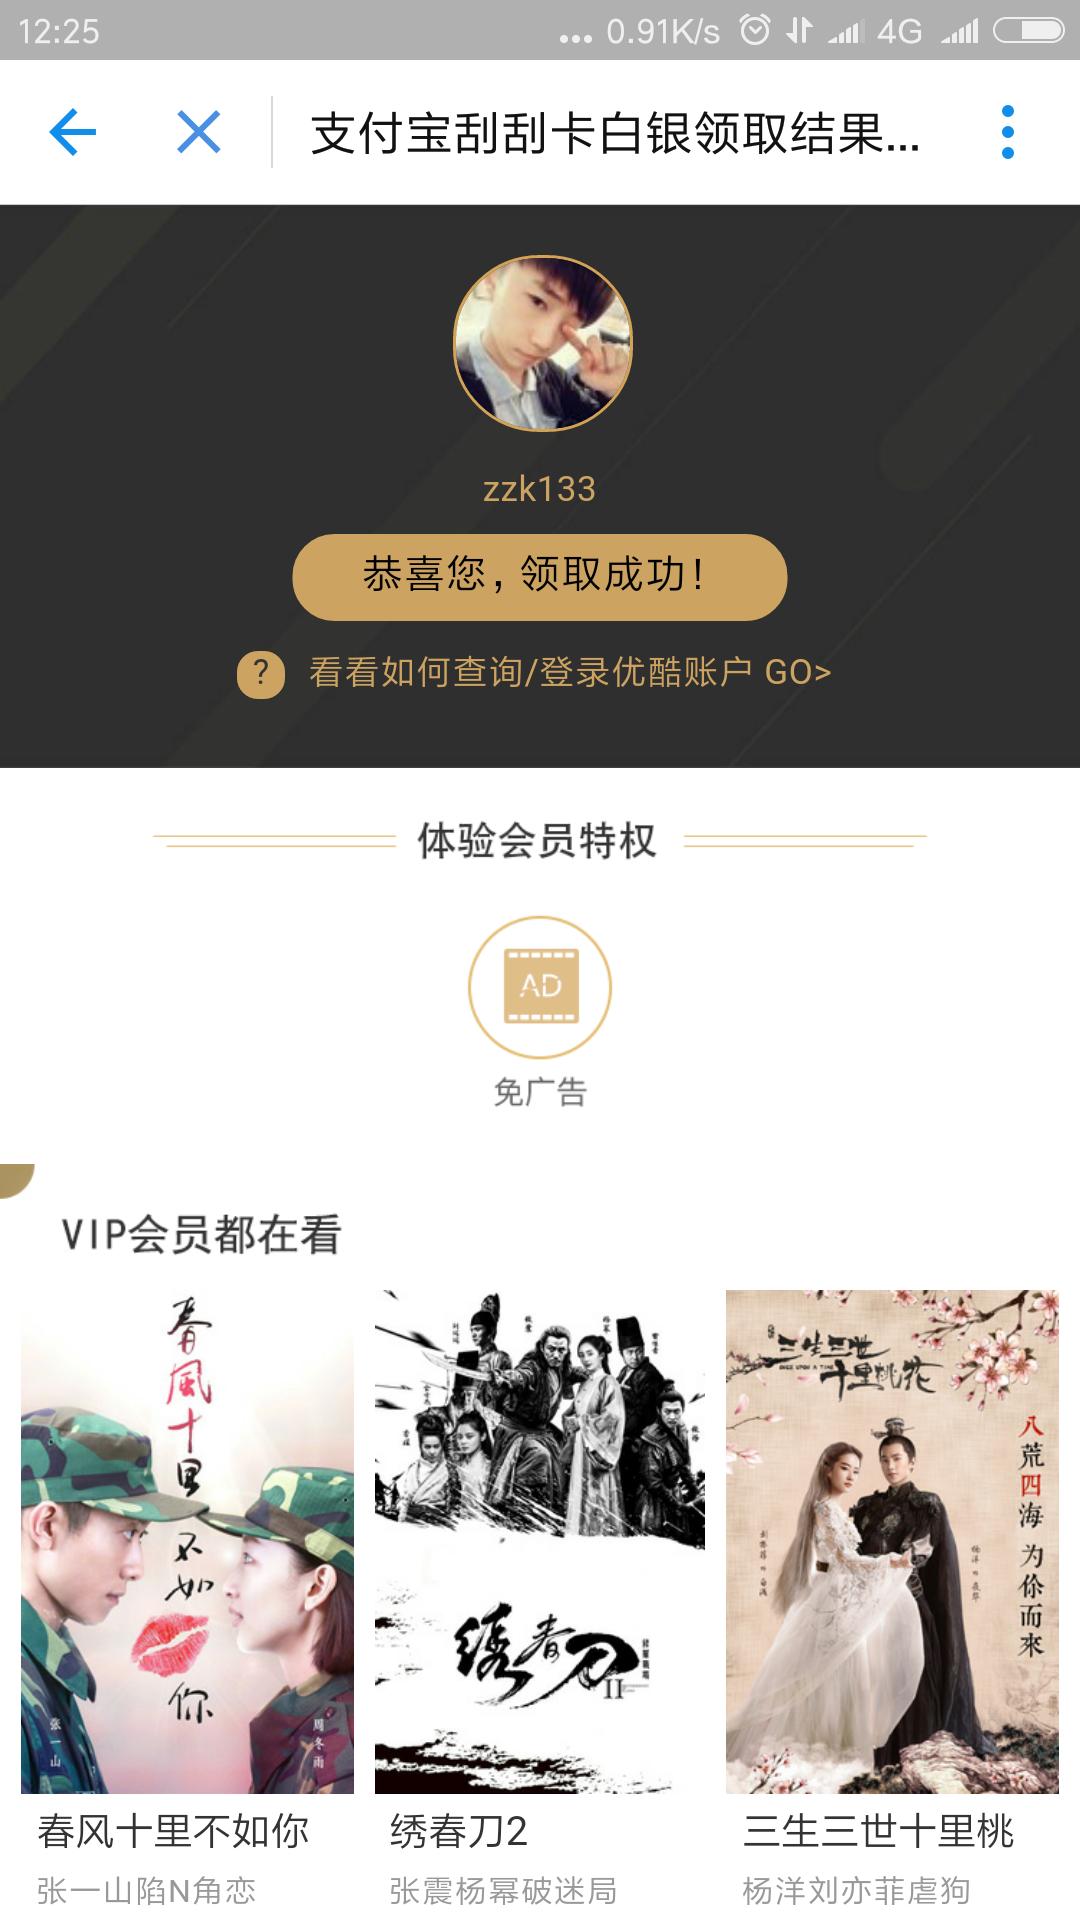 Screenshot_2017-09-15-12-25-16-190_com.eg.android.AlipayGphone.png